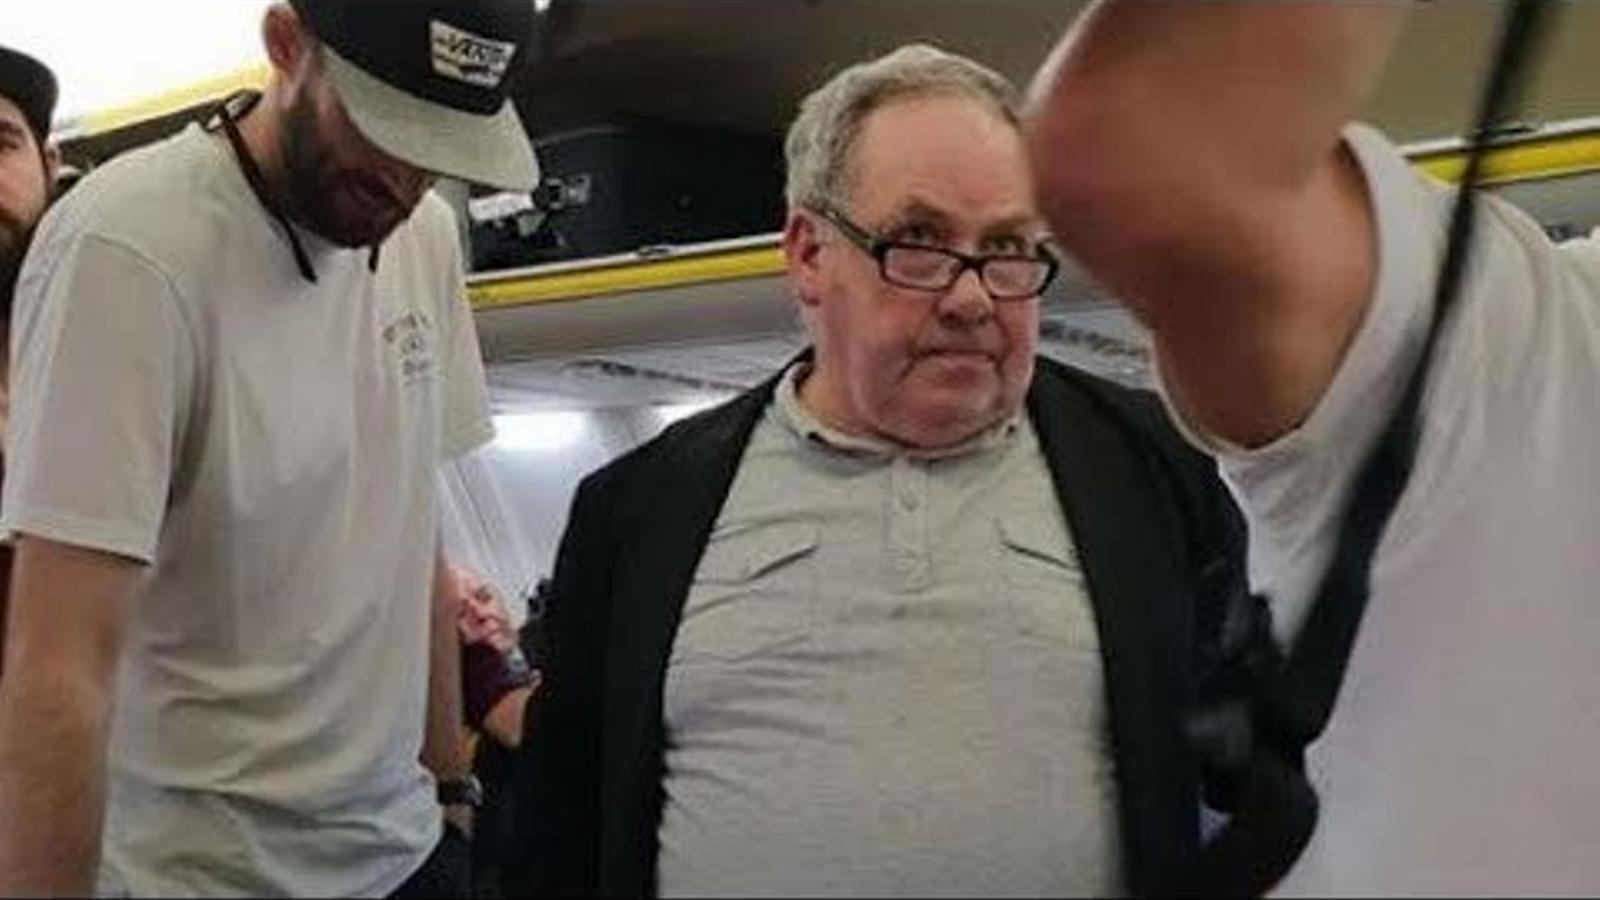 Demanen boicot a Ryanair per no fer fora un home amb actituds racistes